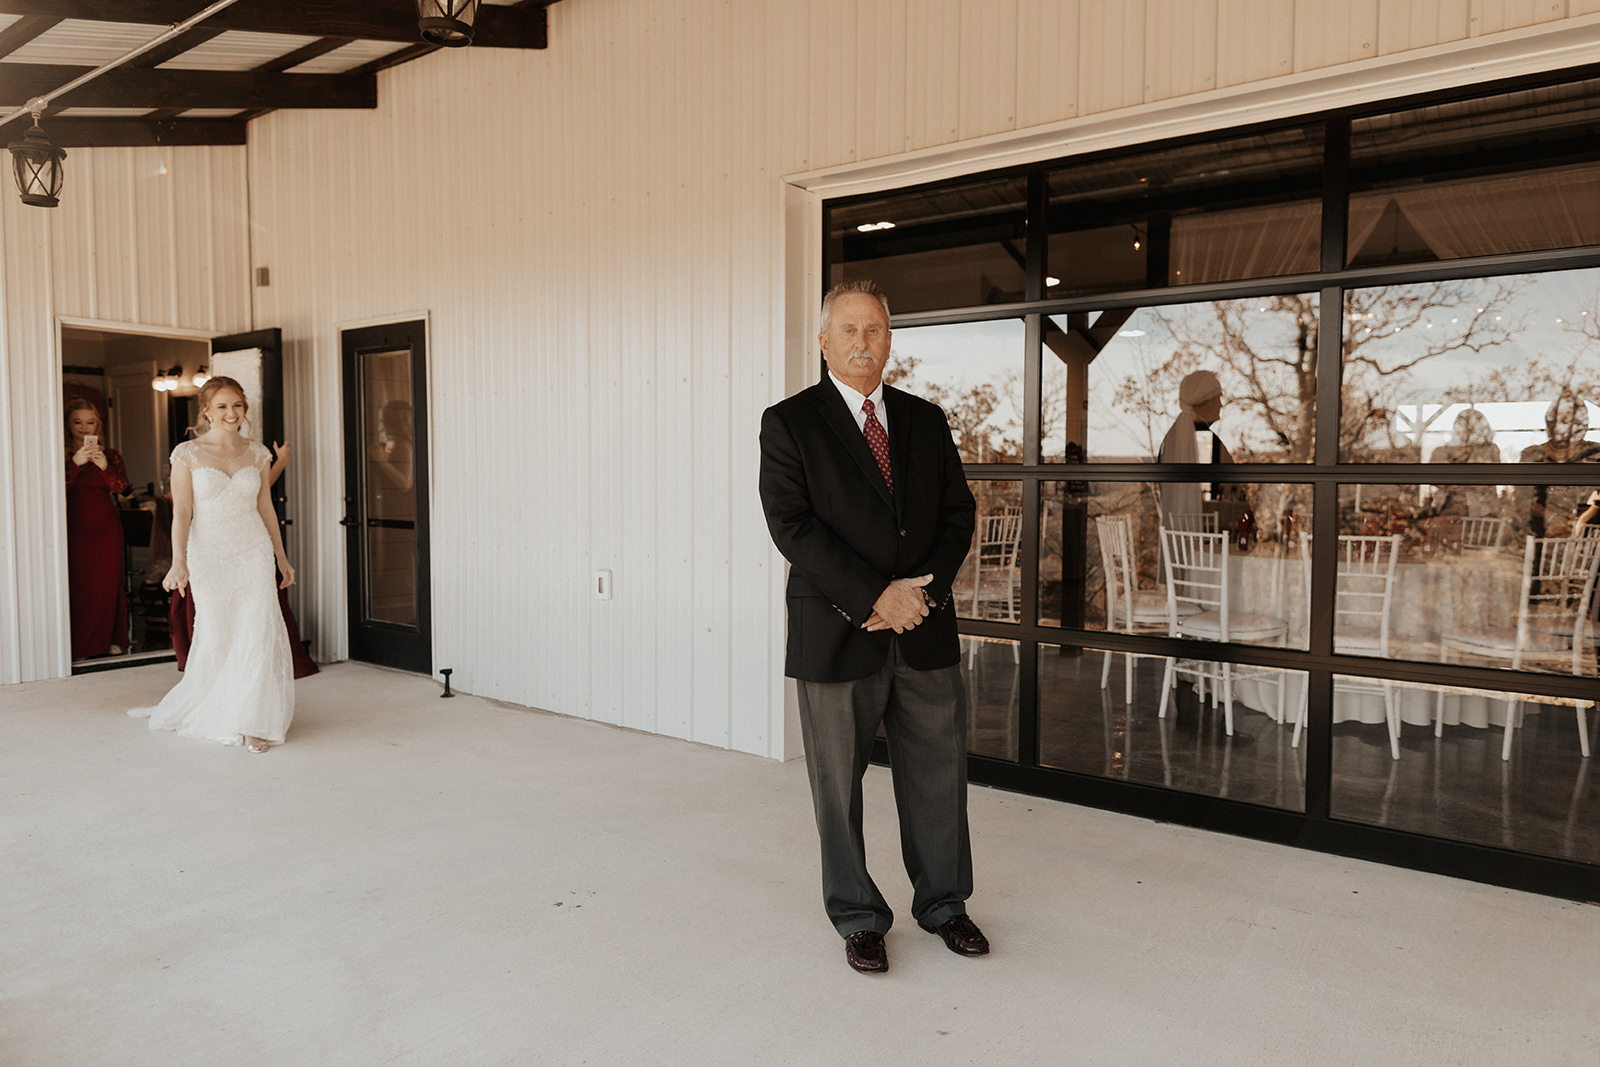 Best Wedding Venue in Tulsa Bixby Dream Point Ranch 11.jpg